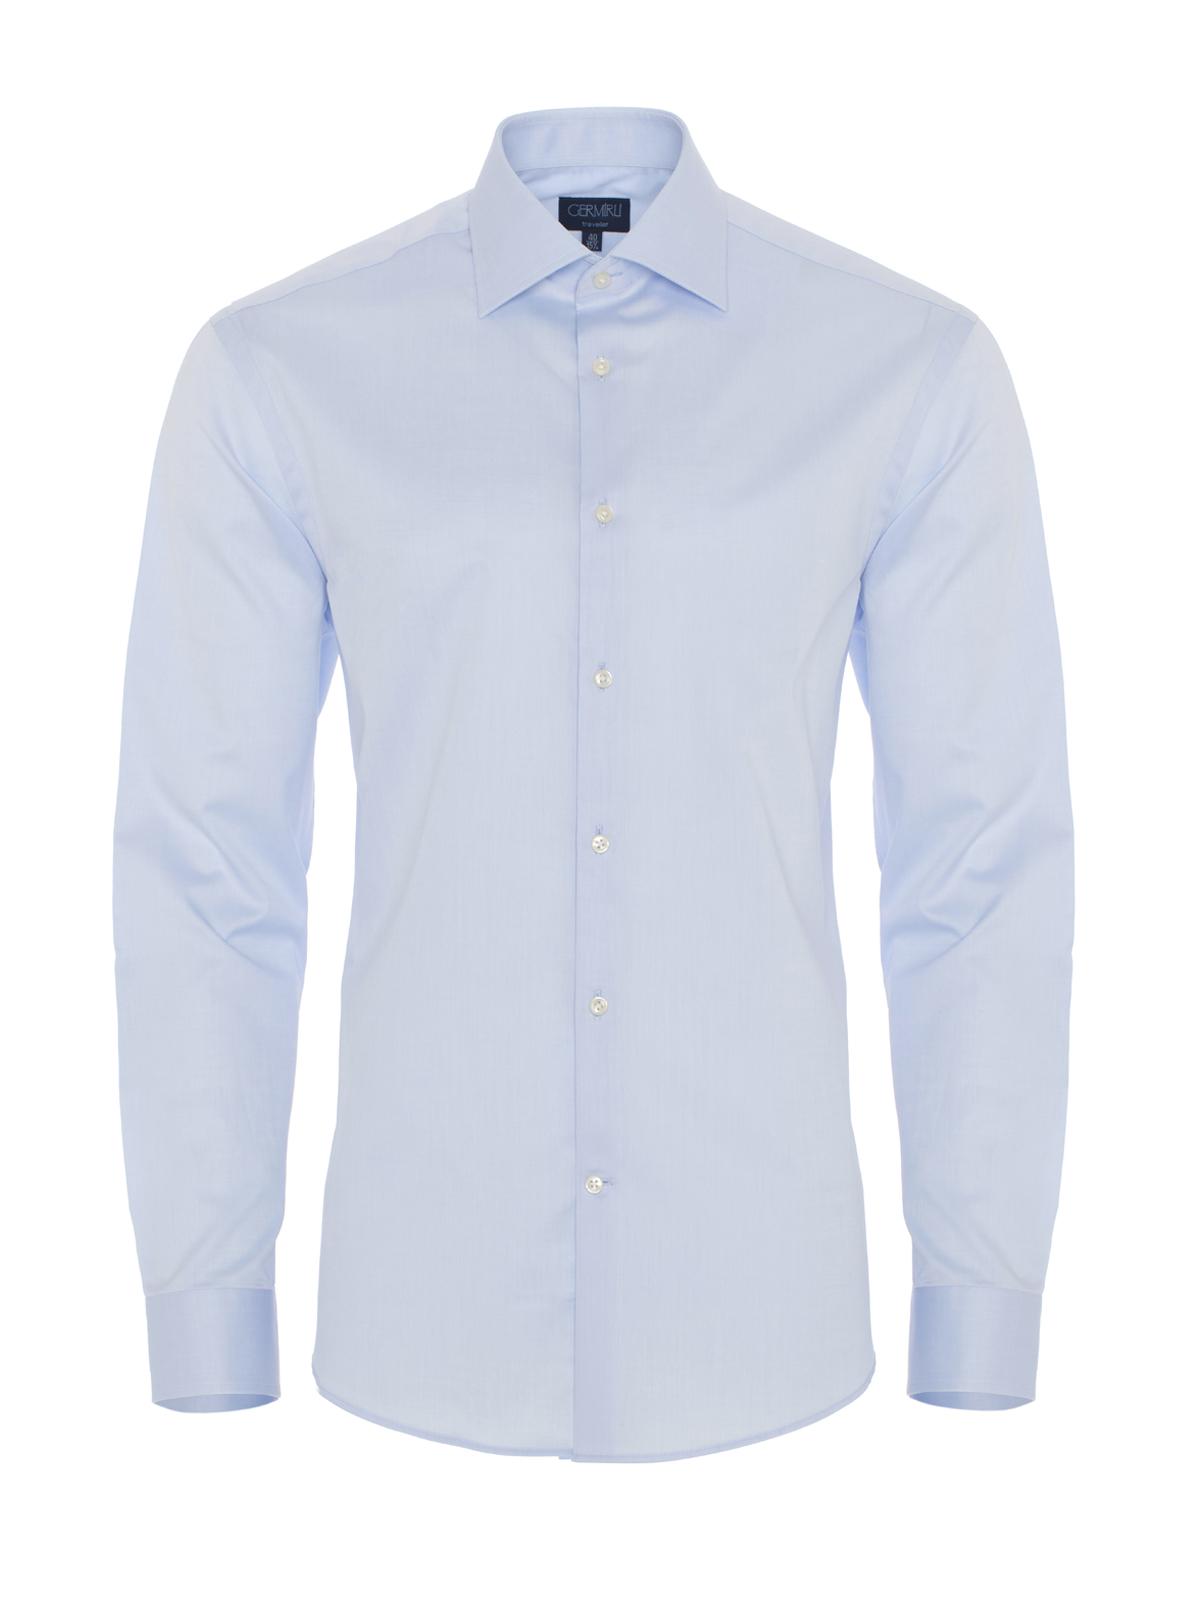 Germirli Non Iron Light Blue Twill Tailor Fit Shirt